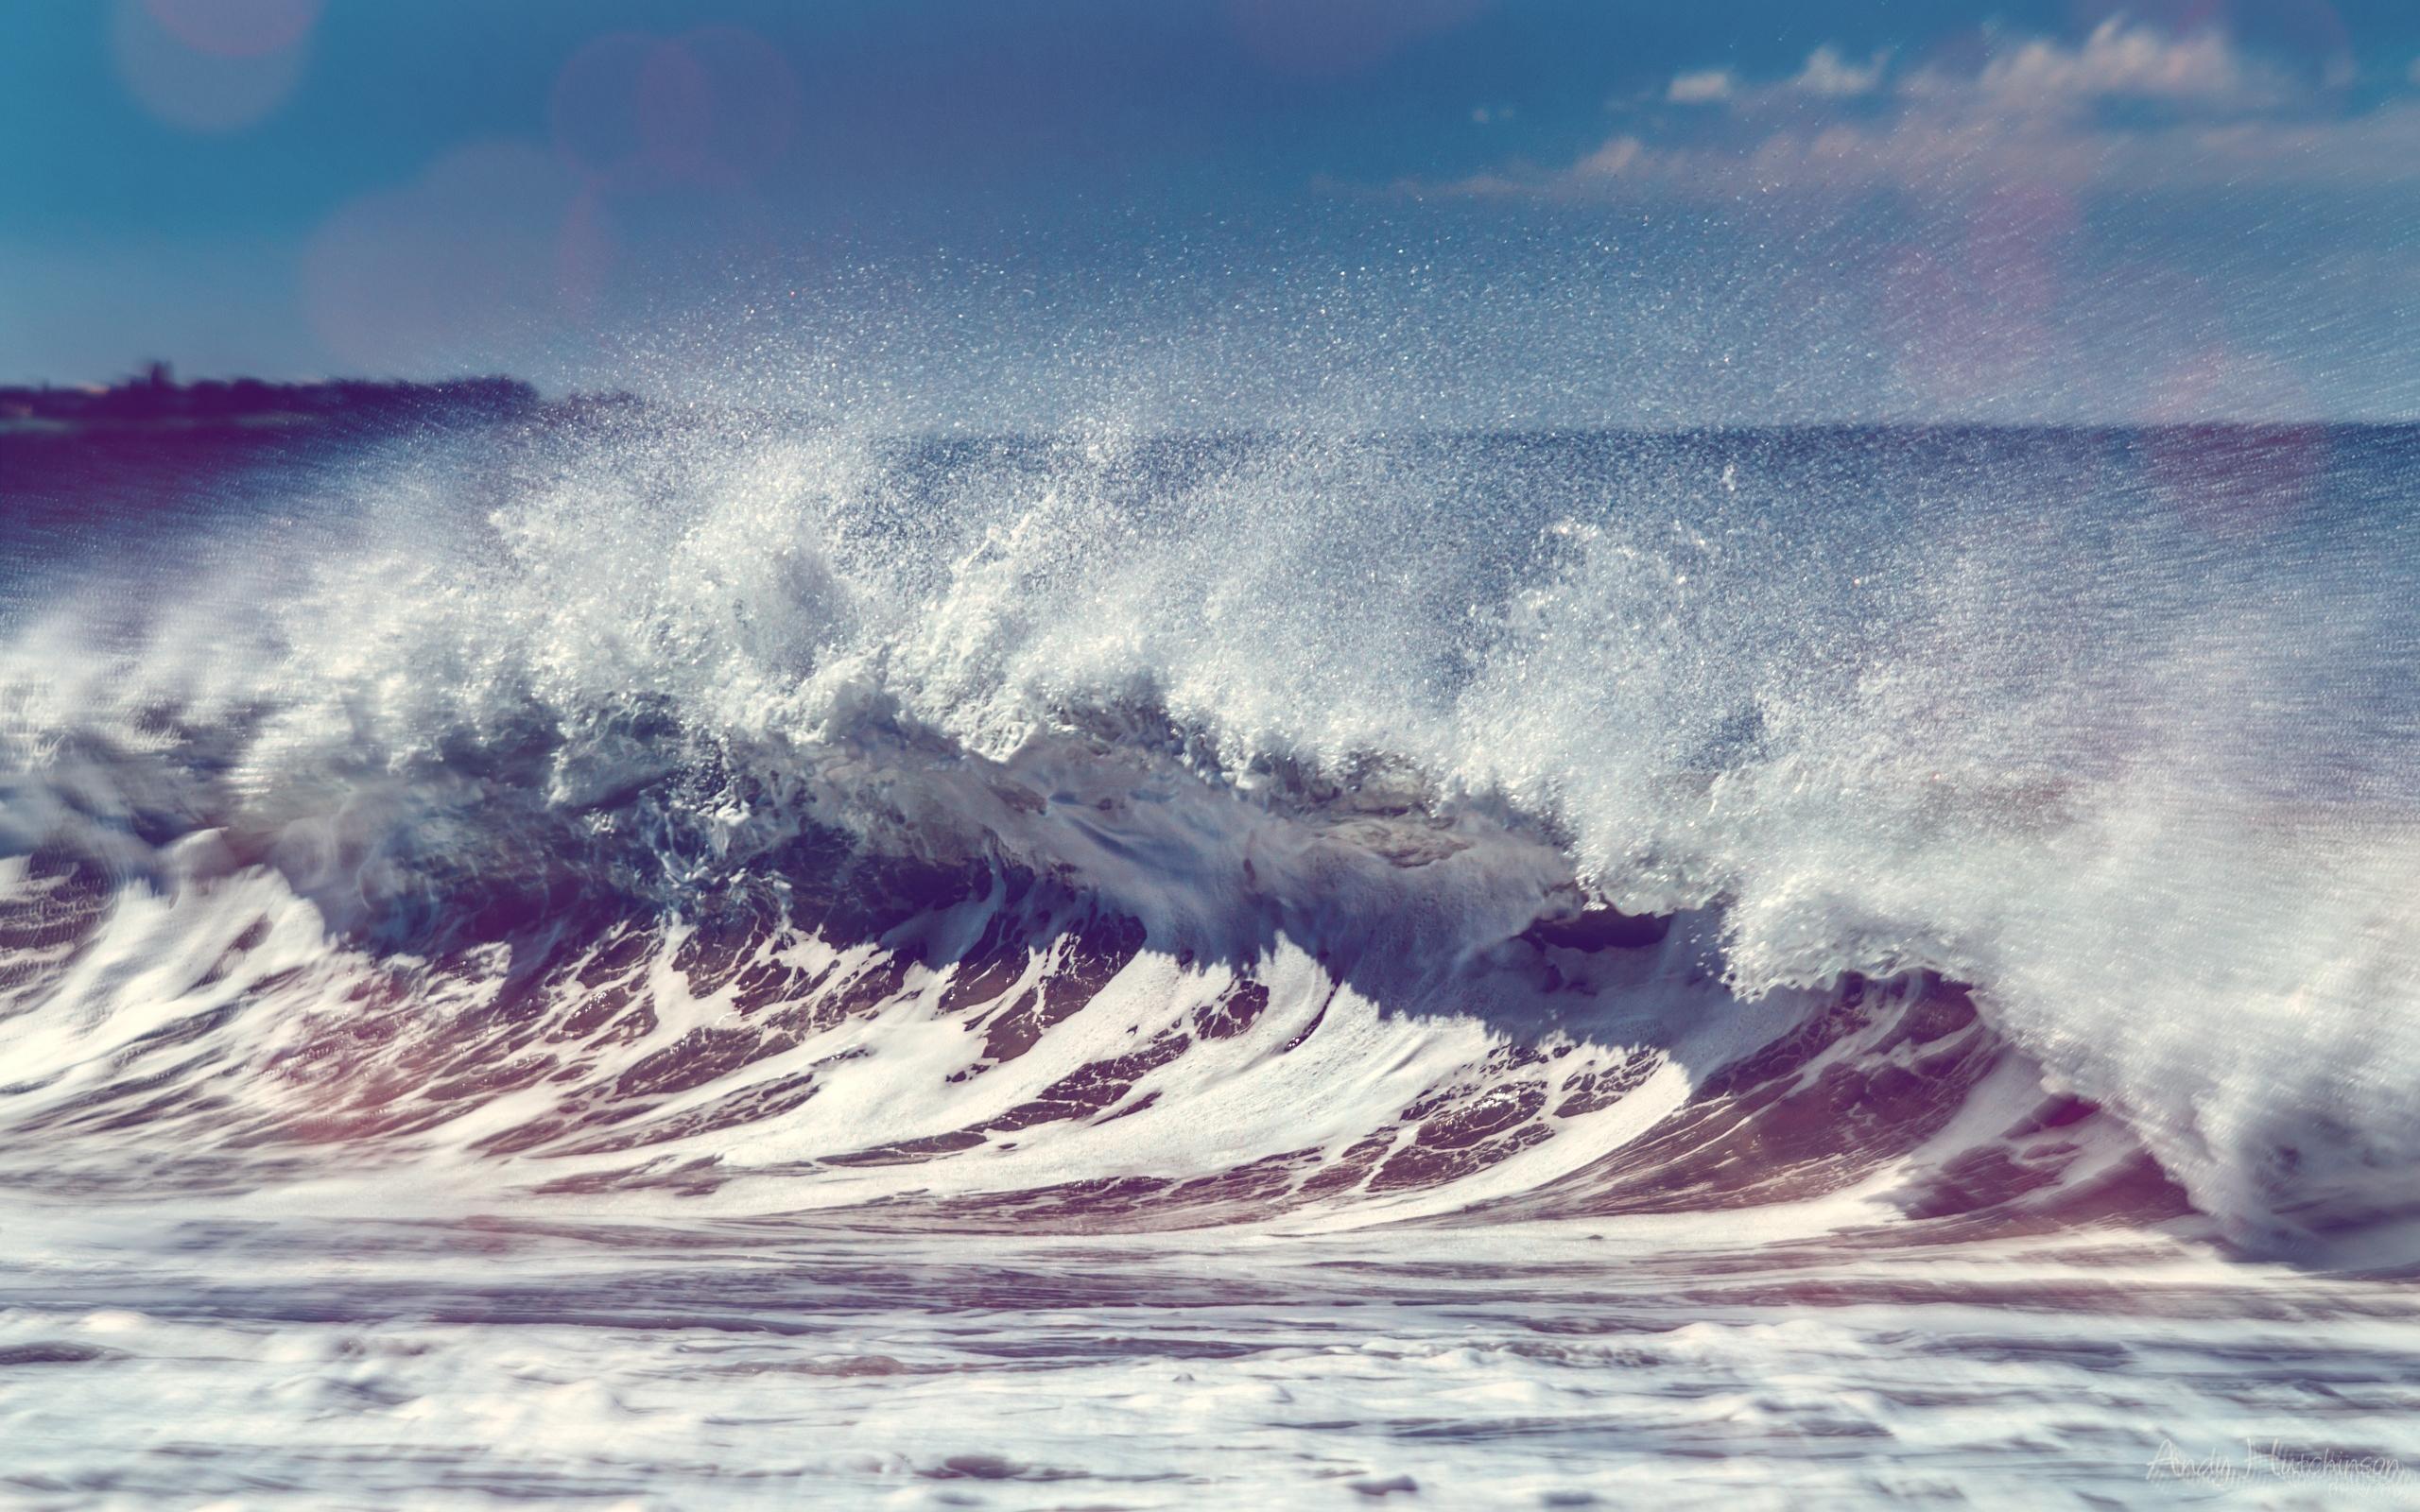 Море волны брызги  № 2203198 бесплатно